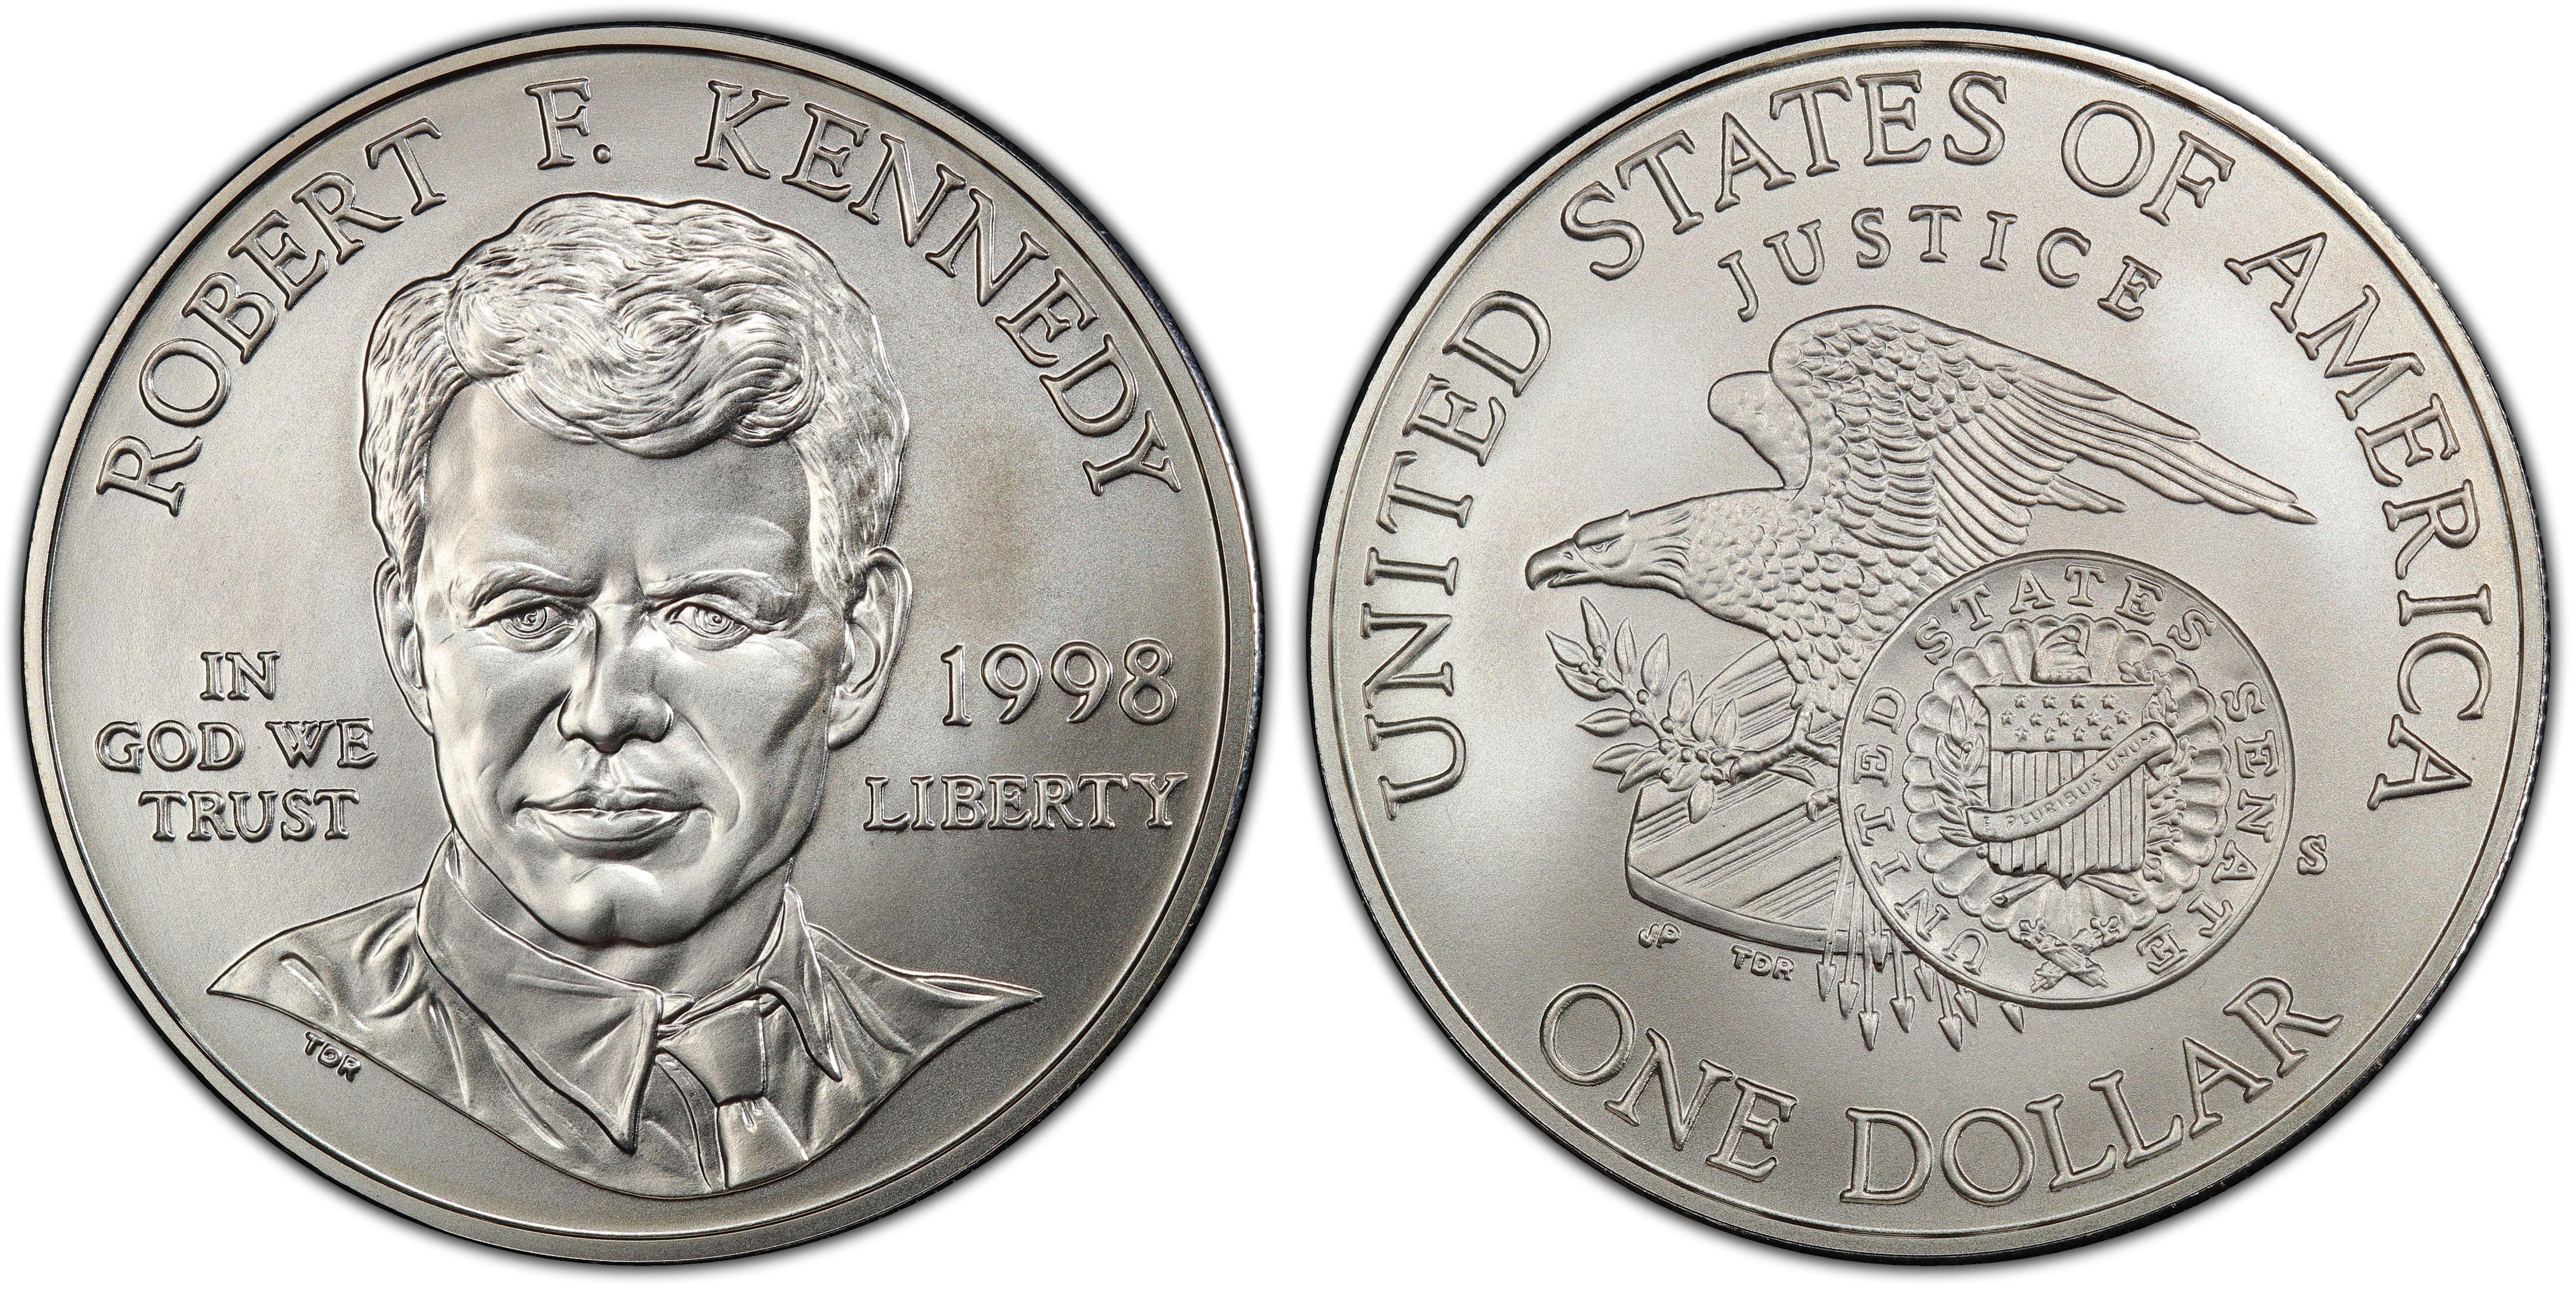 1998-S PCGS MS69 RFK Commemorative Dollar New PCGS Label